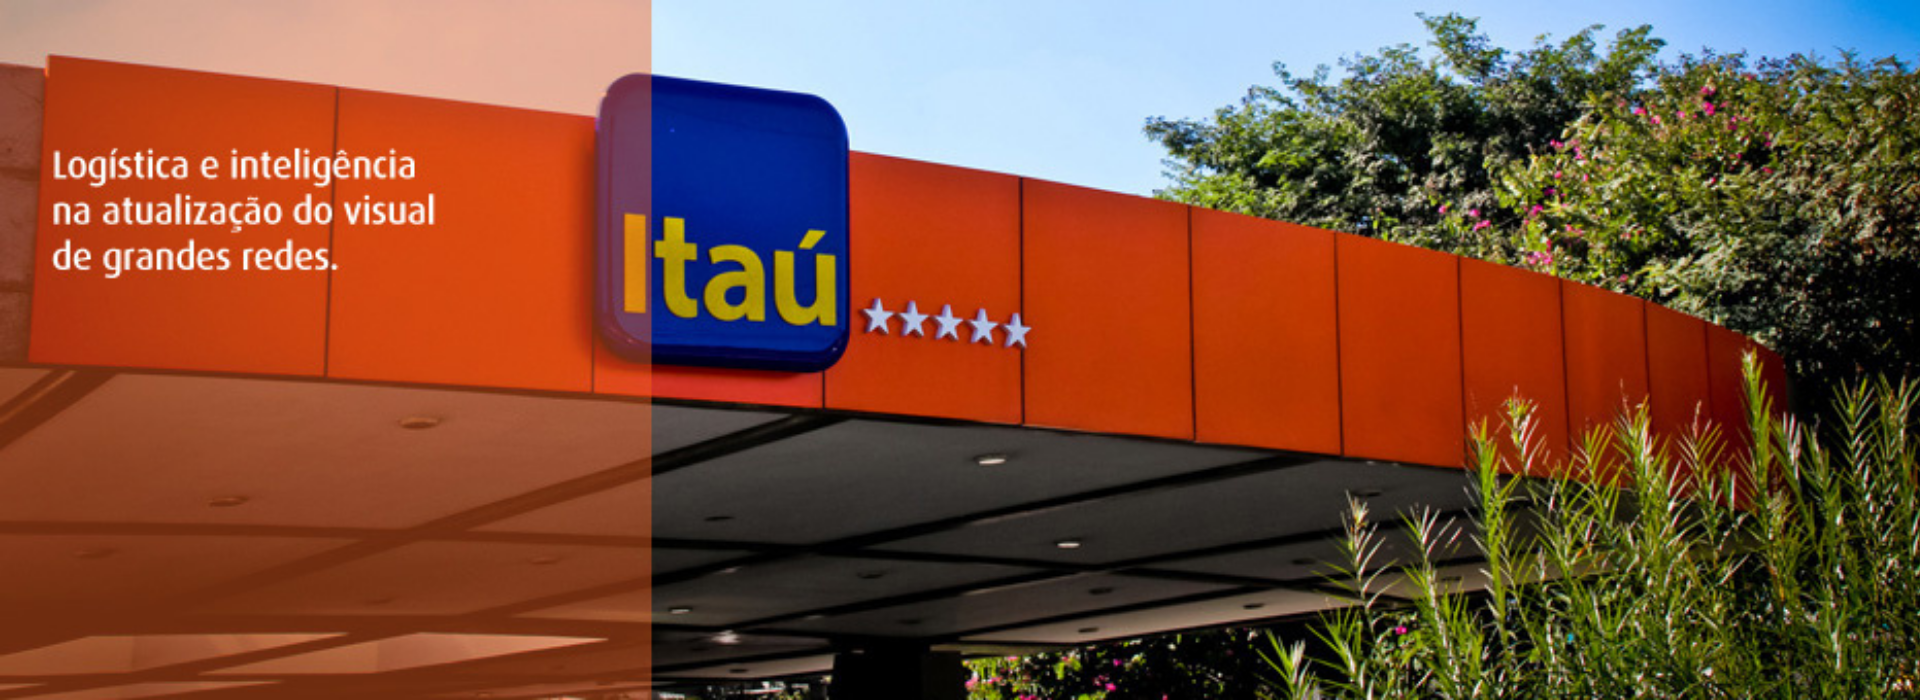 Banner Itaú